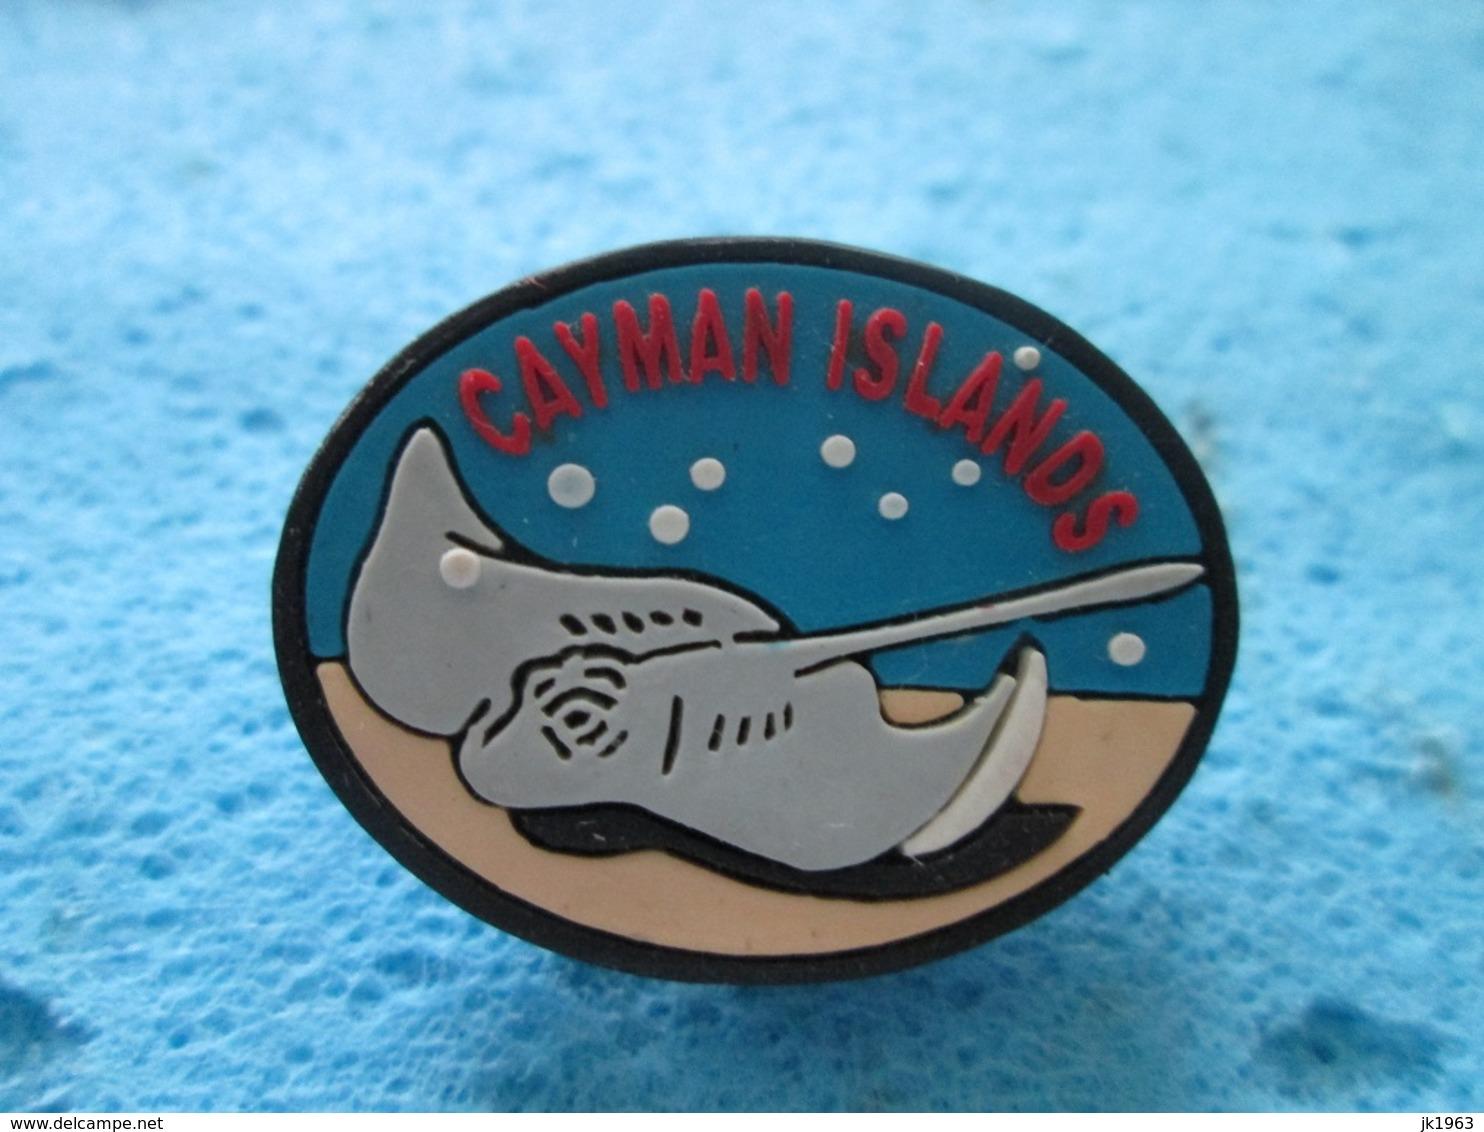 STINGRAY FISH, CAYMAN ISLANDS BADGES - Badges